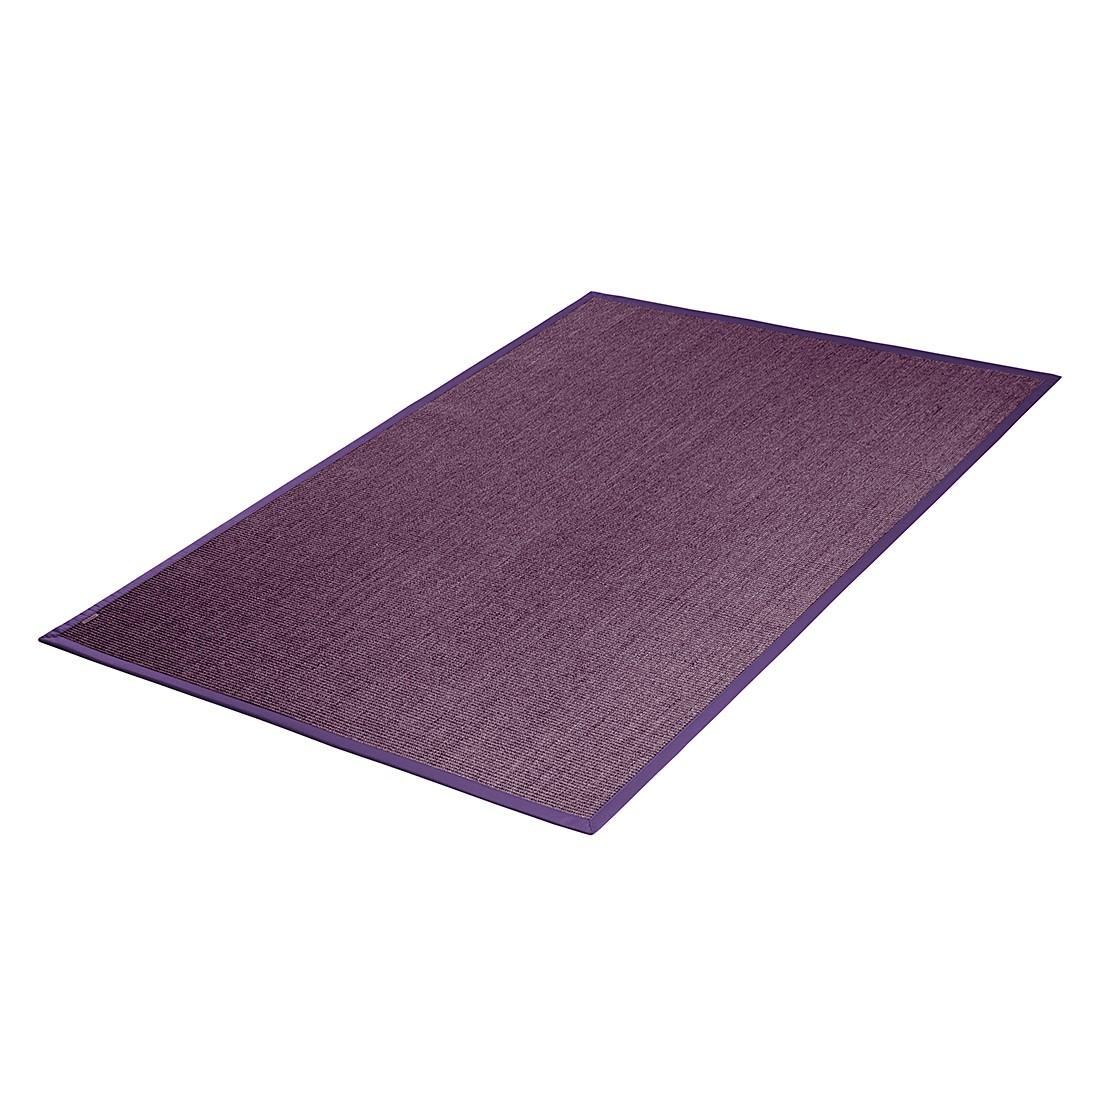 Teppich Mara A2 – Aubergine – 80 x 250 cm, DEKOWE online bestellen